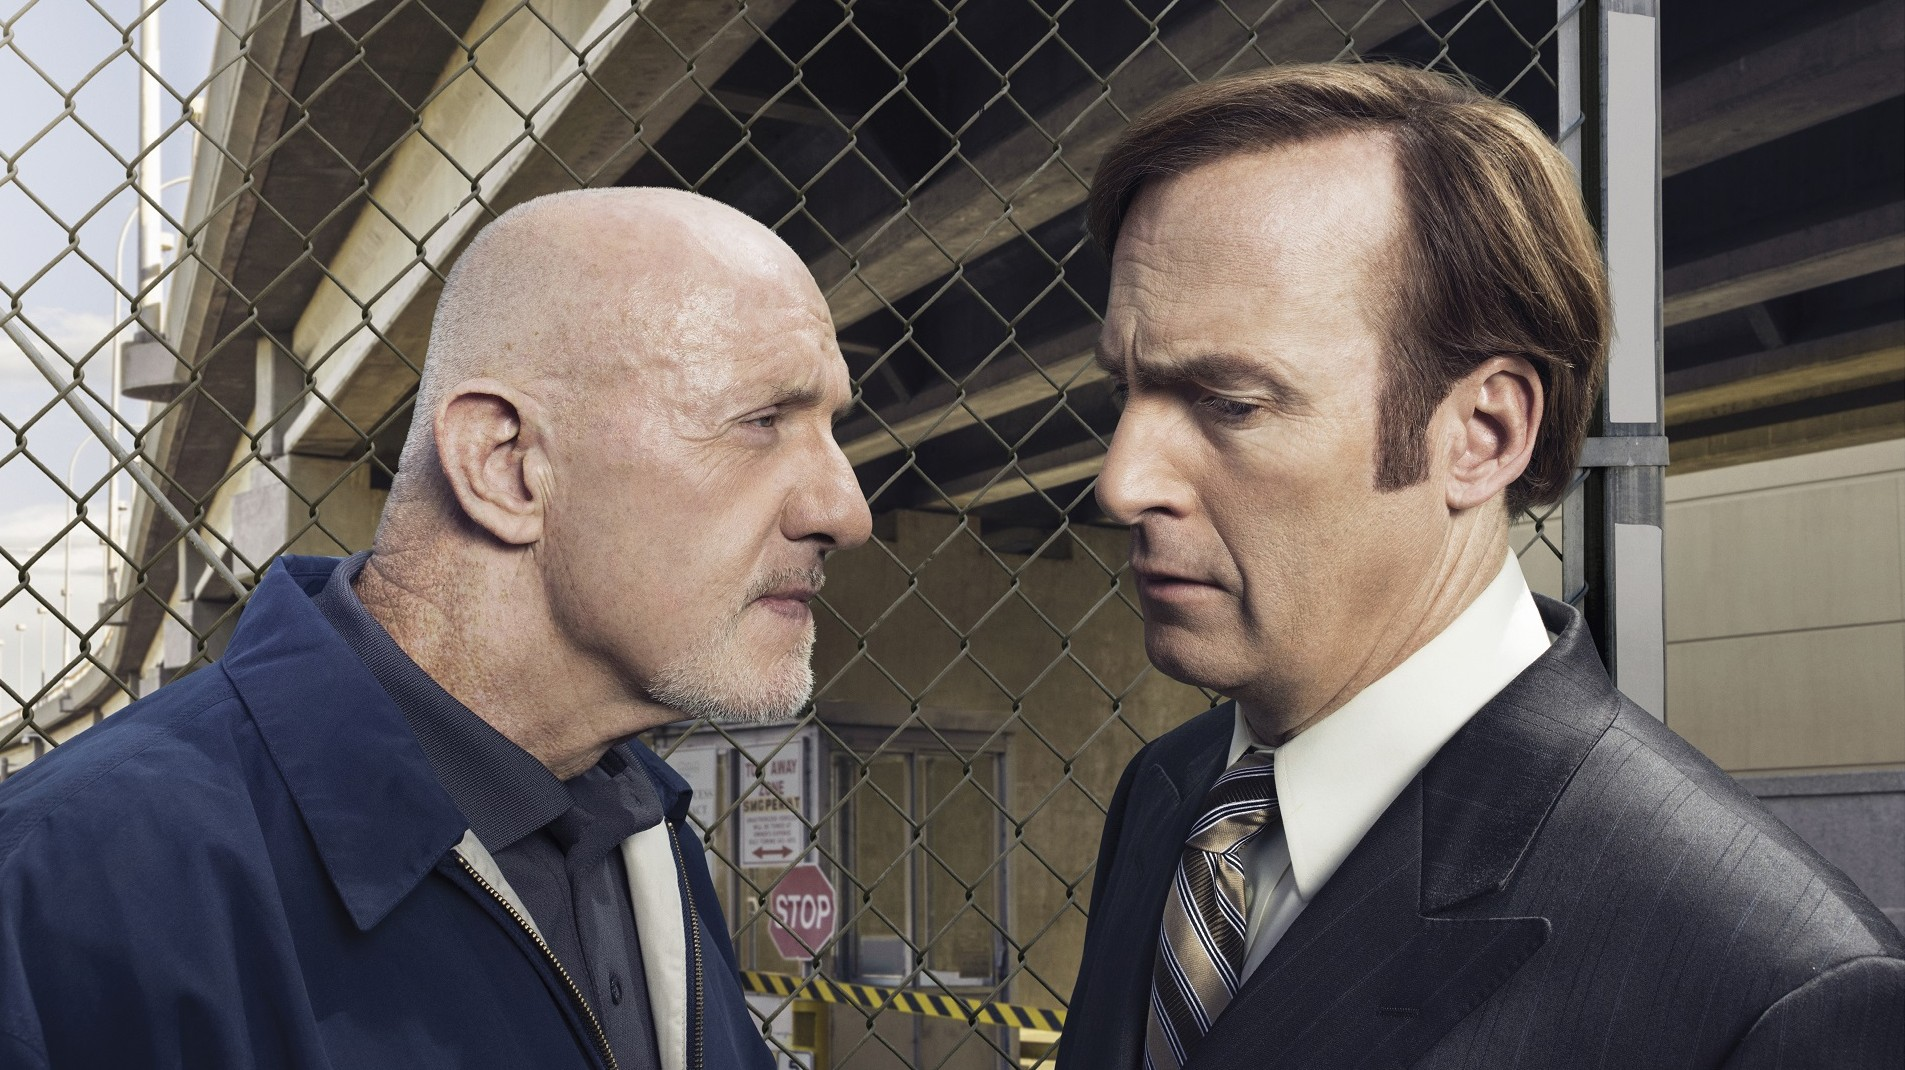 Better Call Saul Season 3 Promo 2